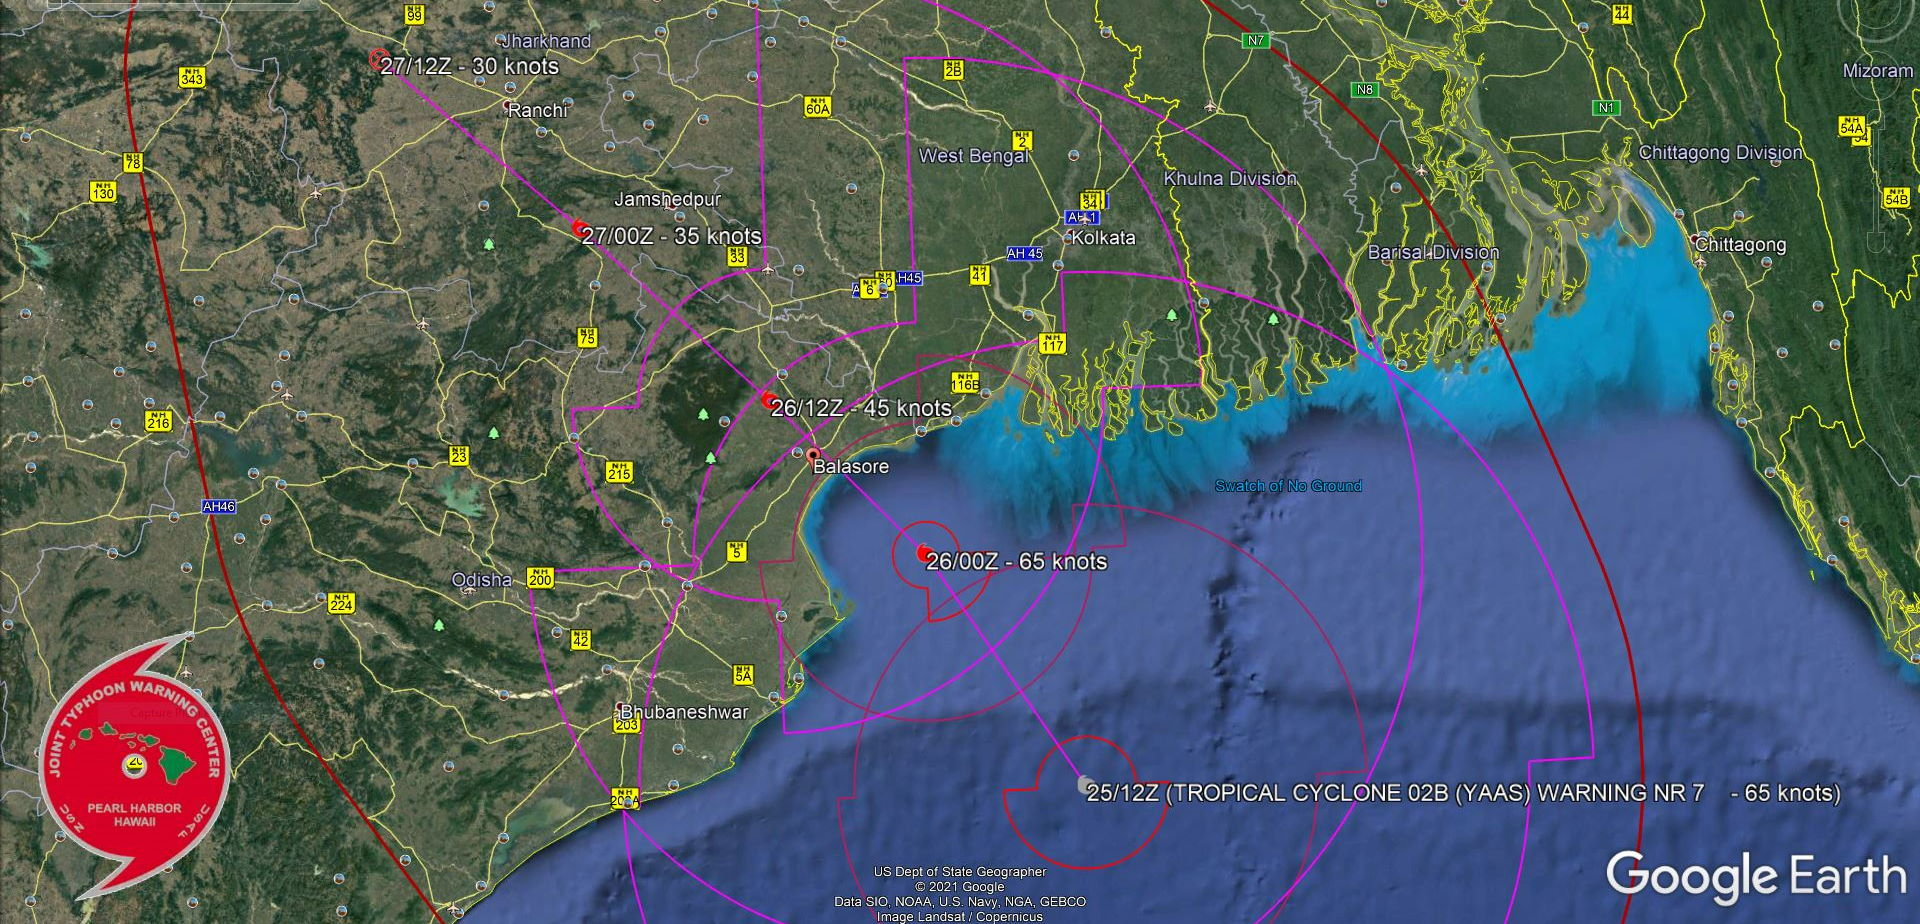 TC 02B(YAAS). WARNING 7. FORECAST LANDFALL AREA NEAR BALASORE/ODISHA SHORTLY BEFROE 24H.